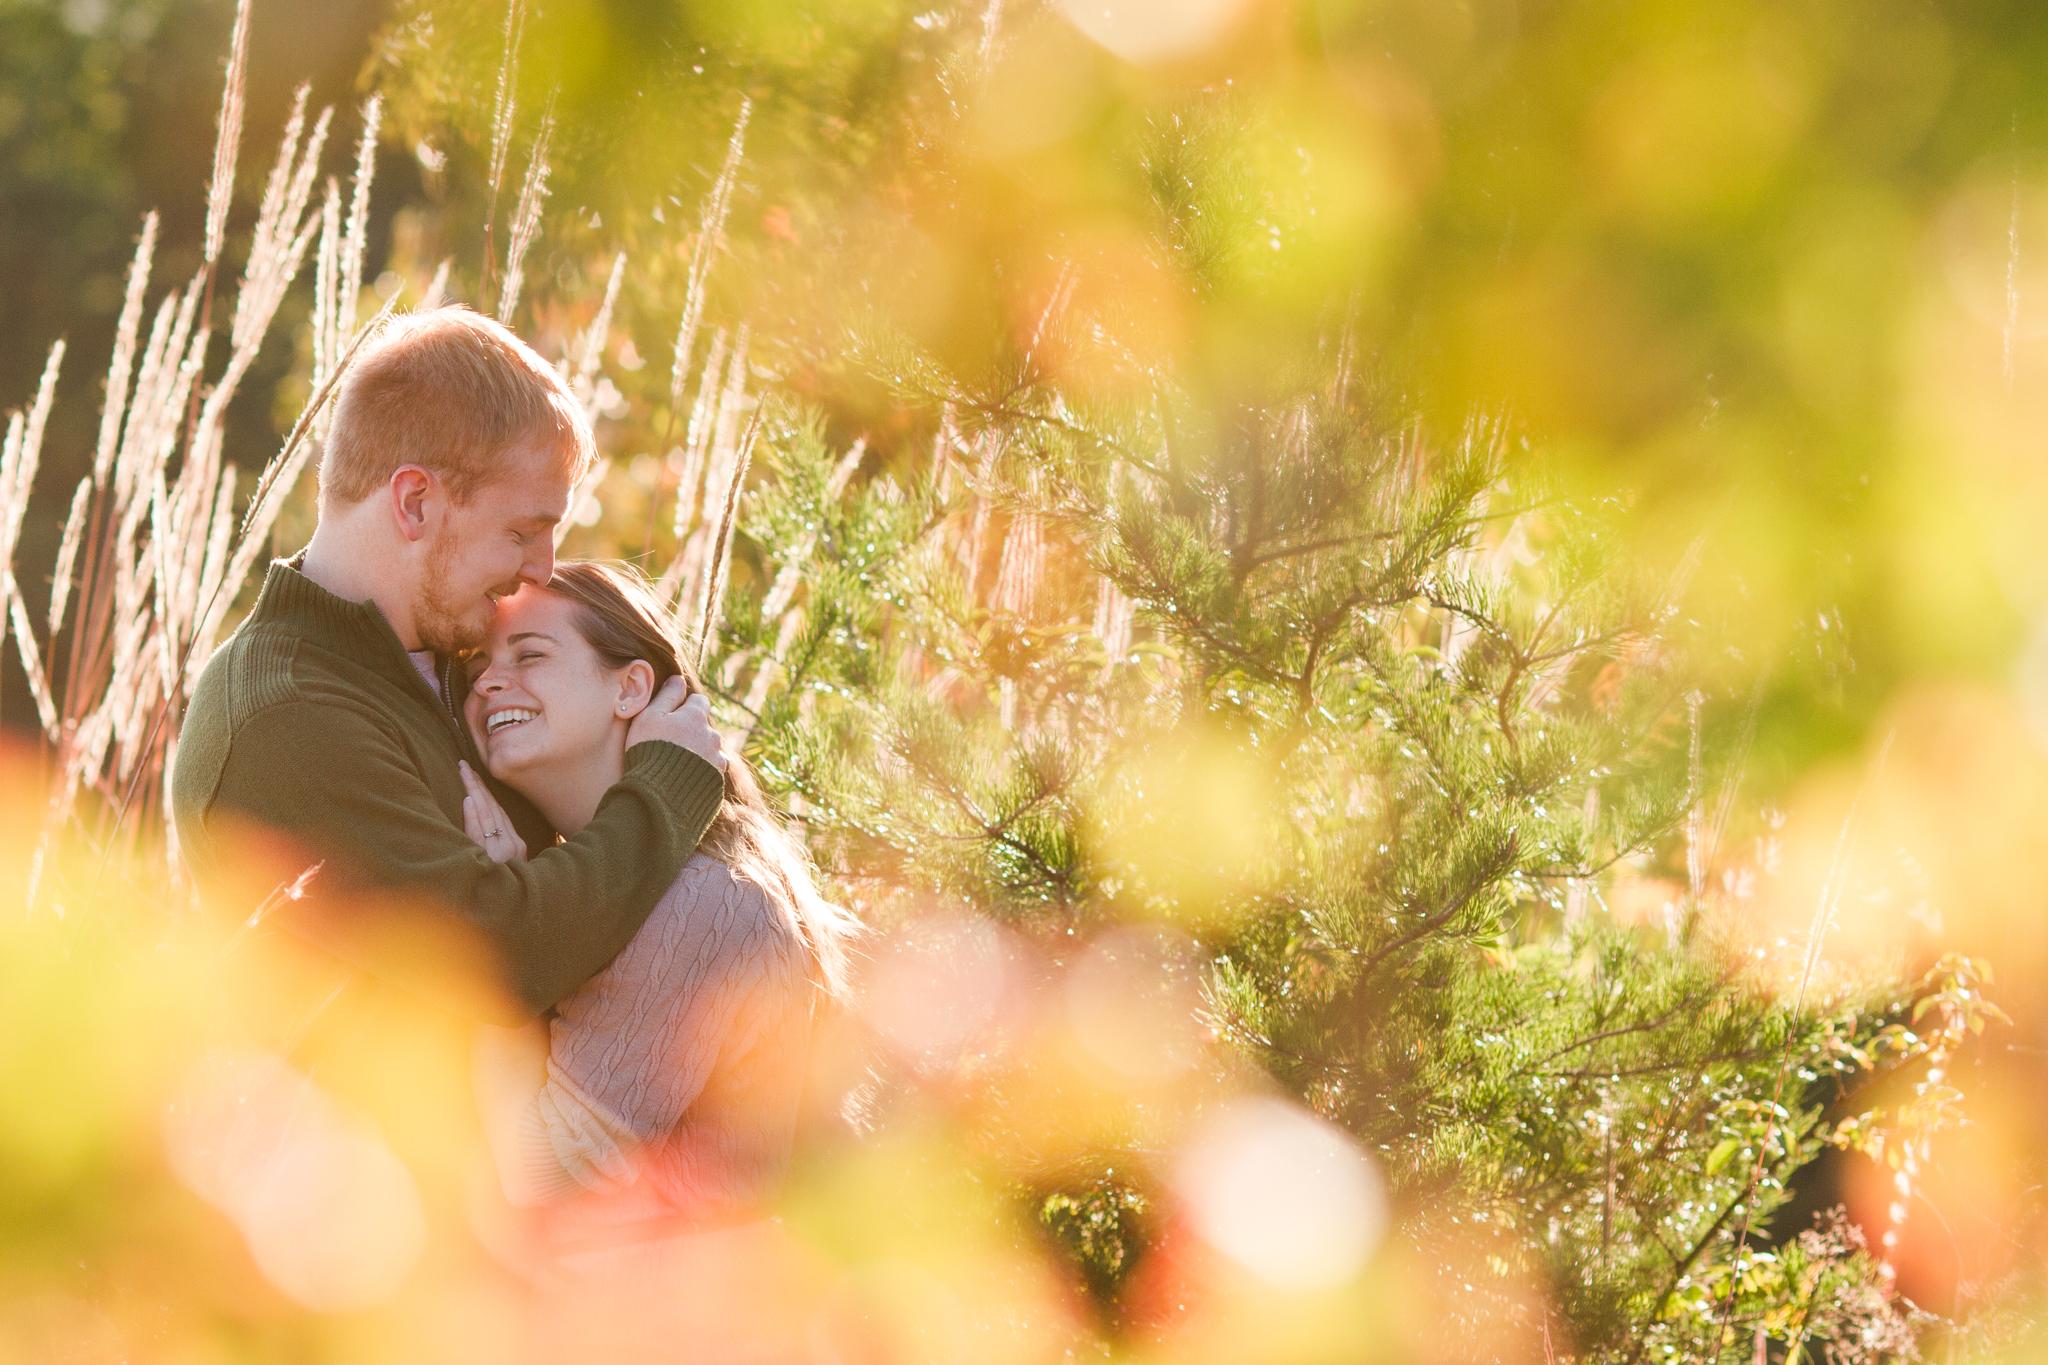 Ashley-Amber-Photo-Outdoor-Wedding-Photography-175006.jpg